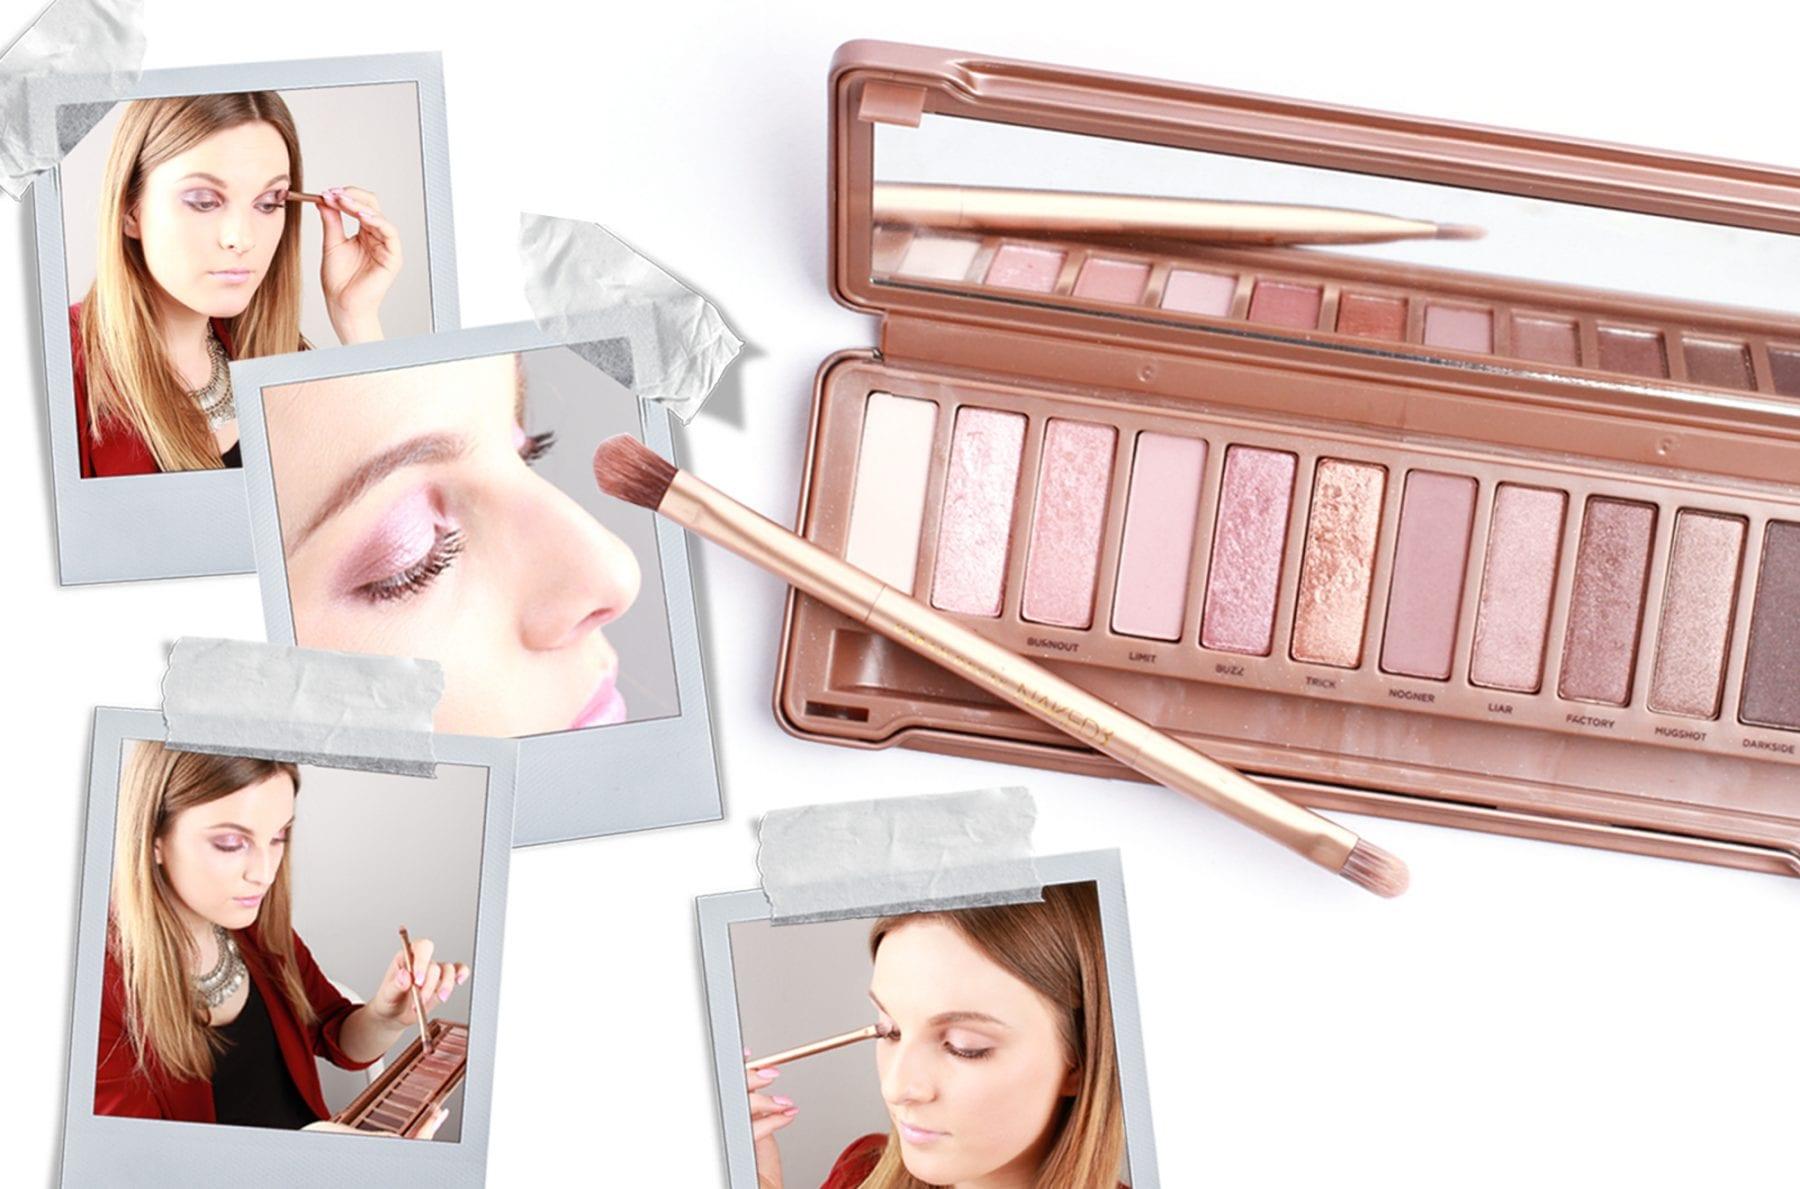 One Eyeshadow Palette, Three Ways To Use It